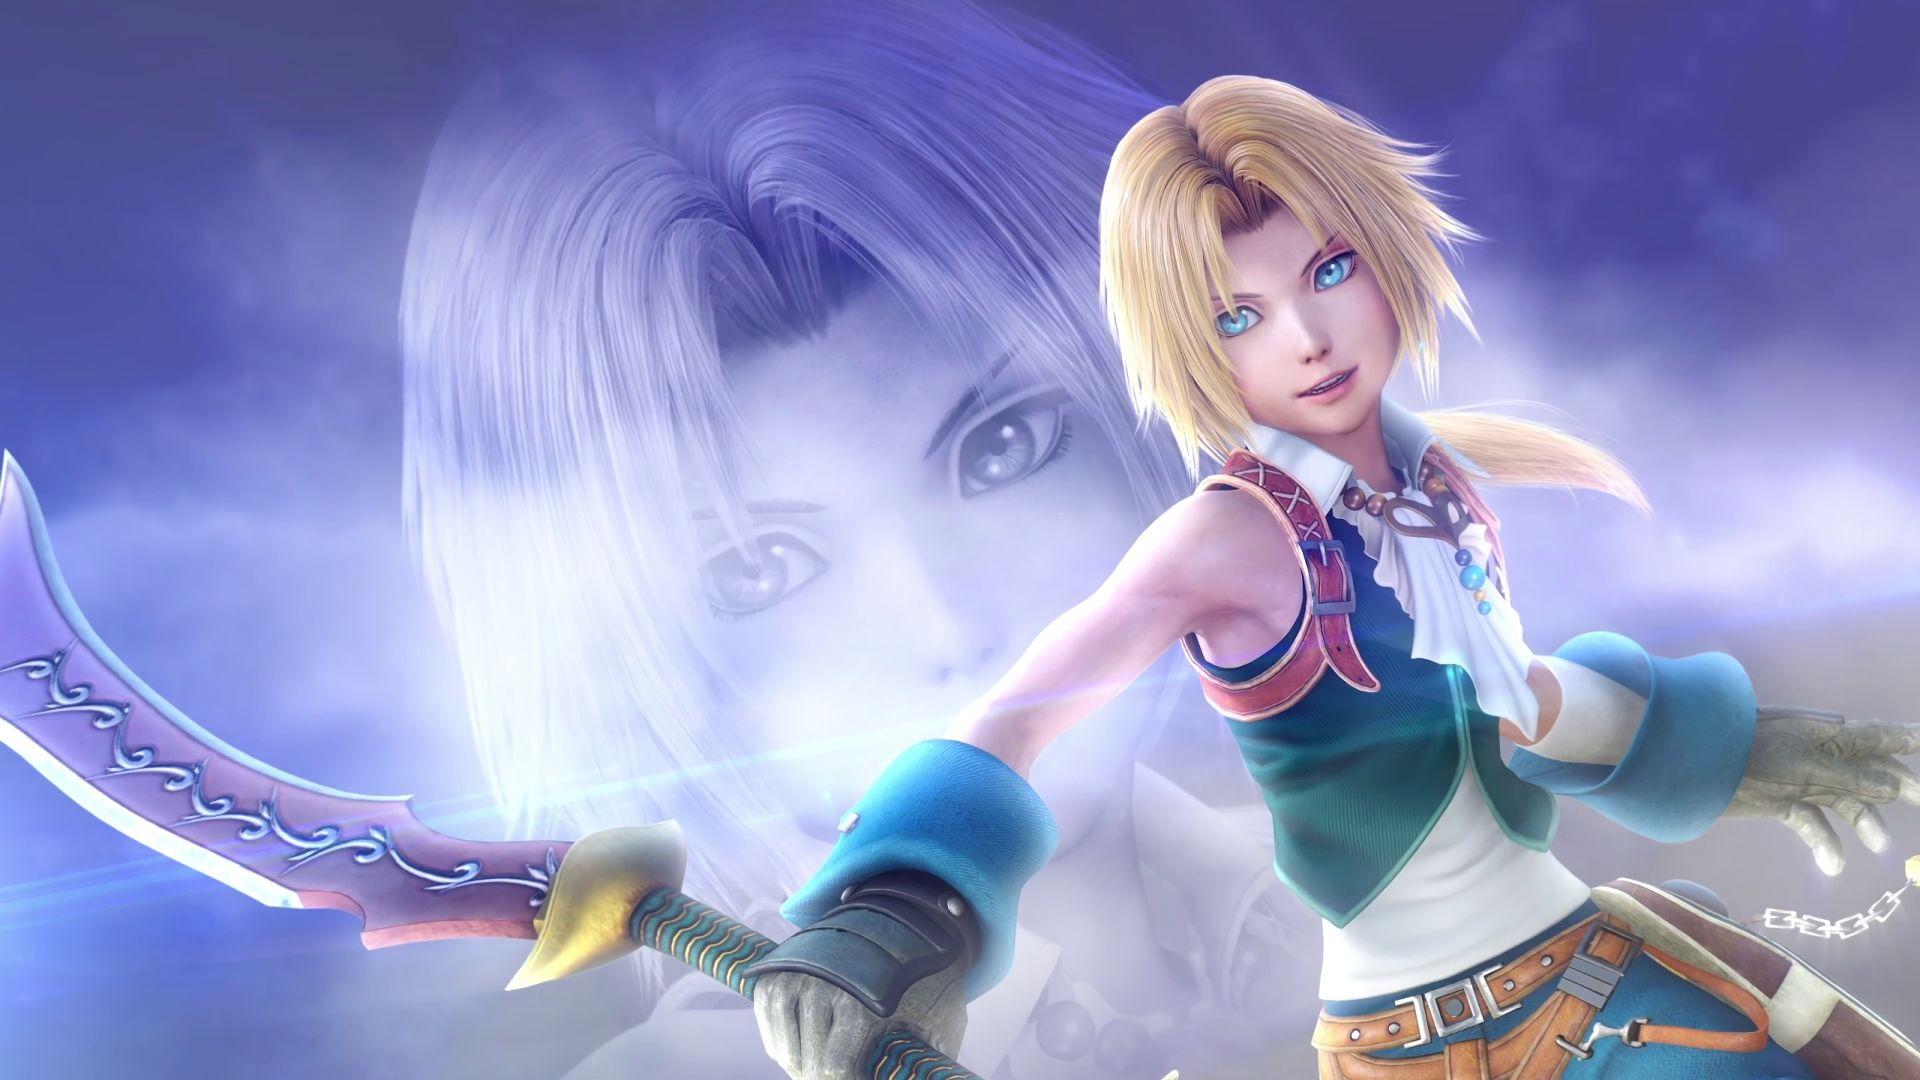 Final Fantasy Dissidia Nt Zidane Tribal Final Fantasy Final